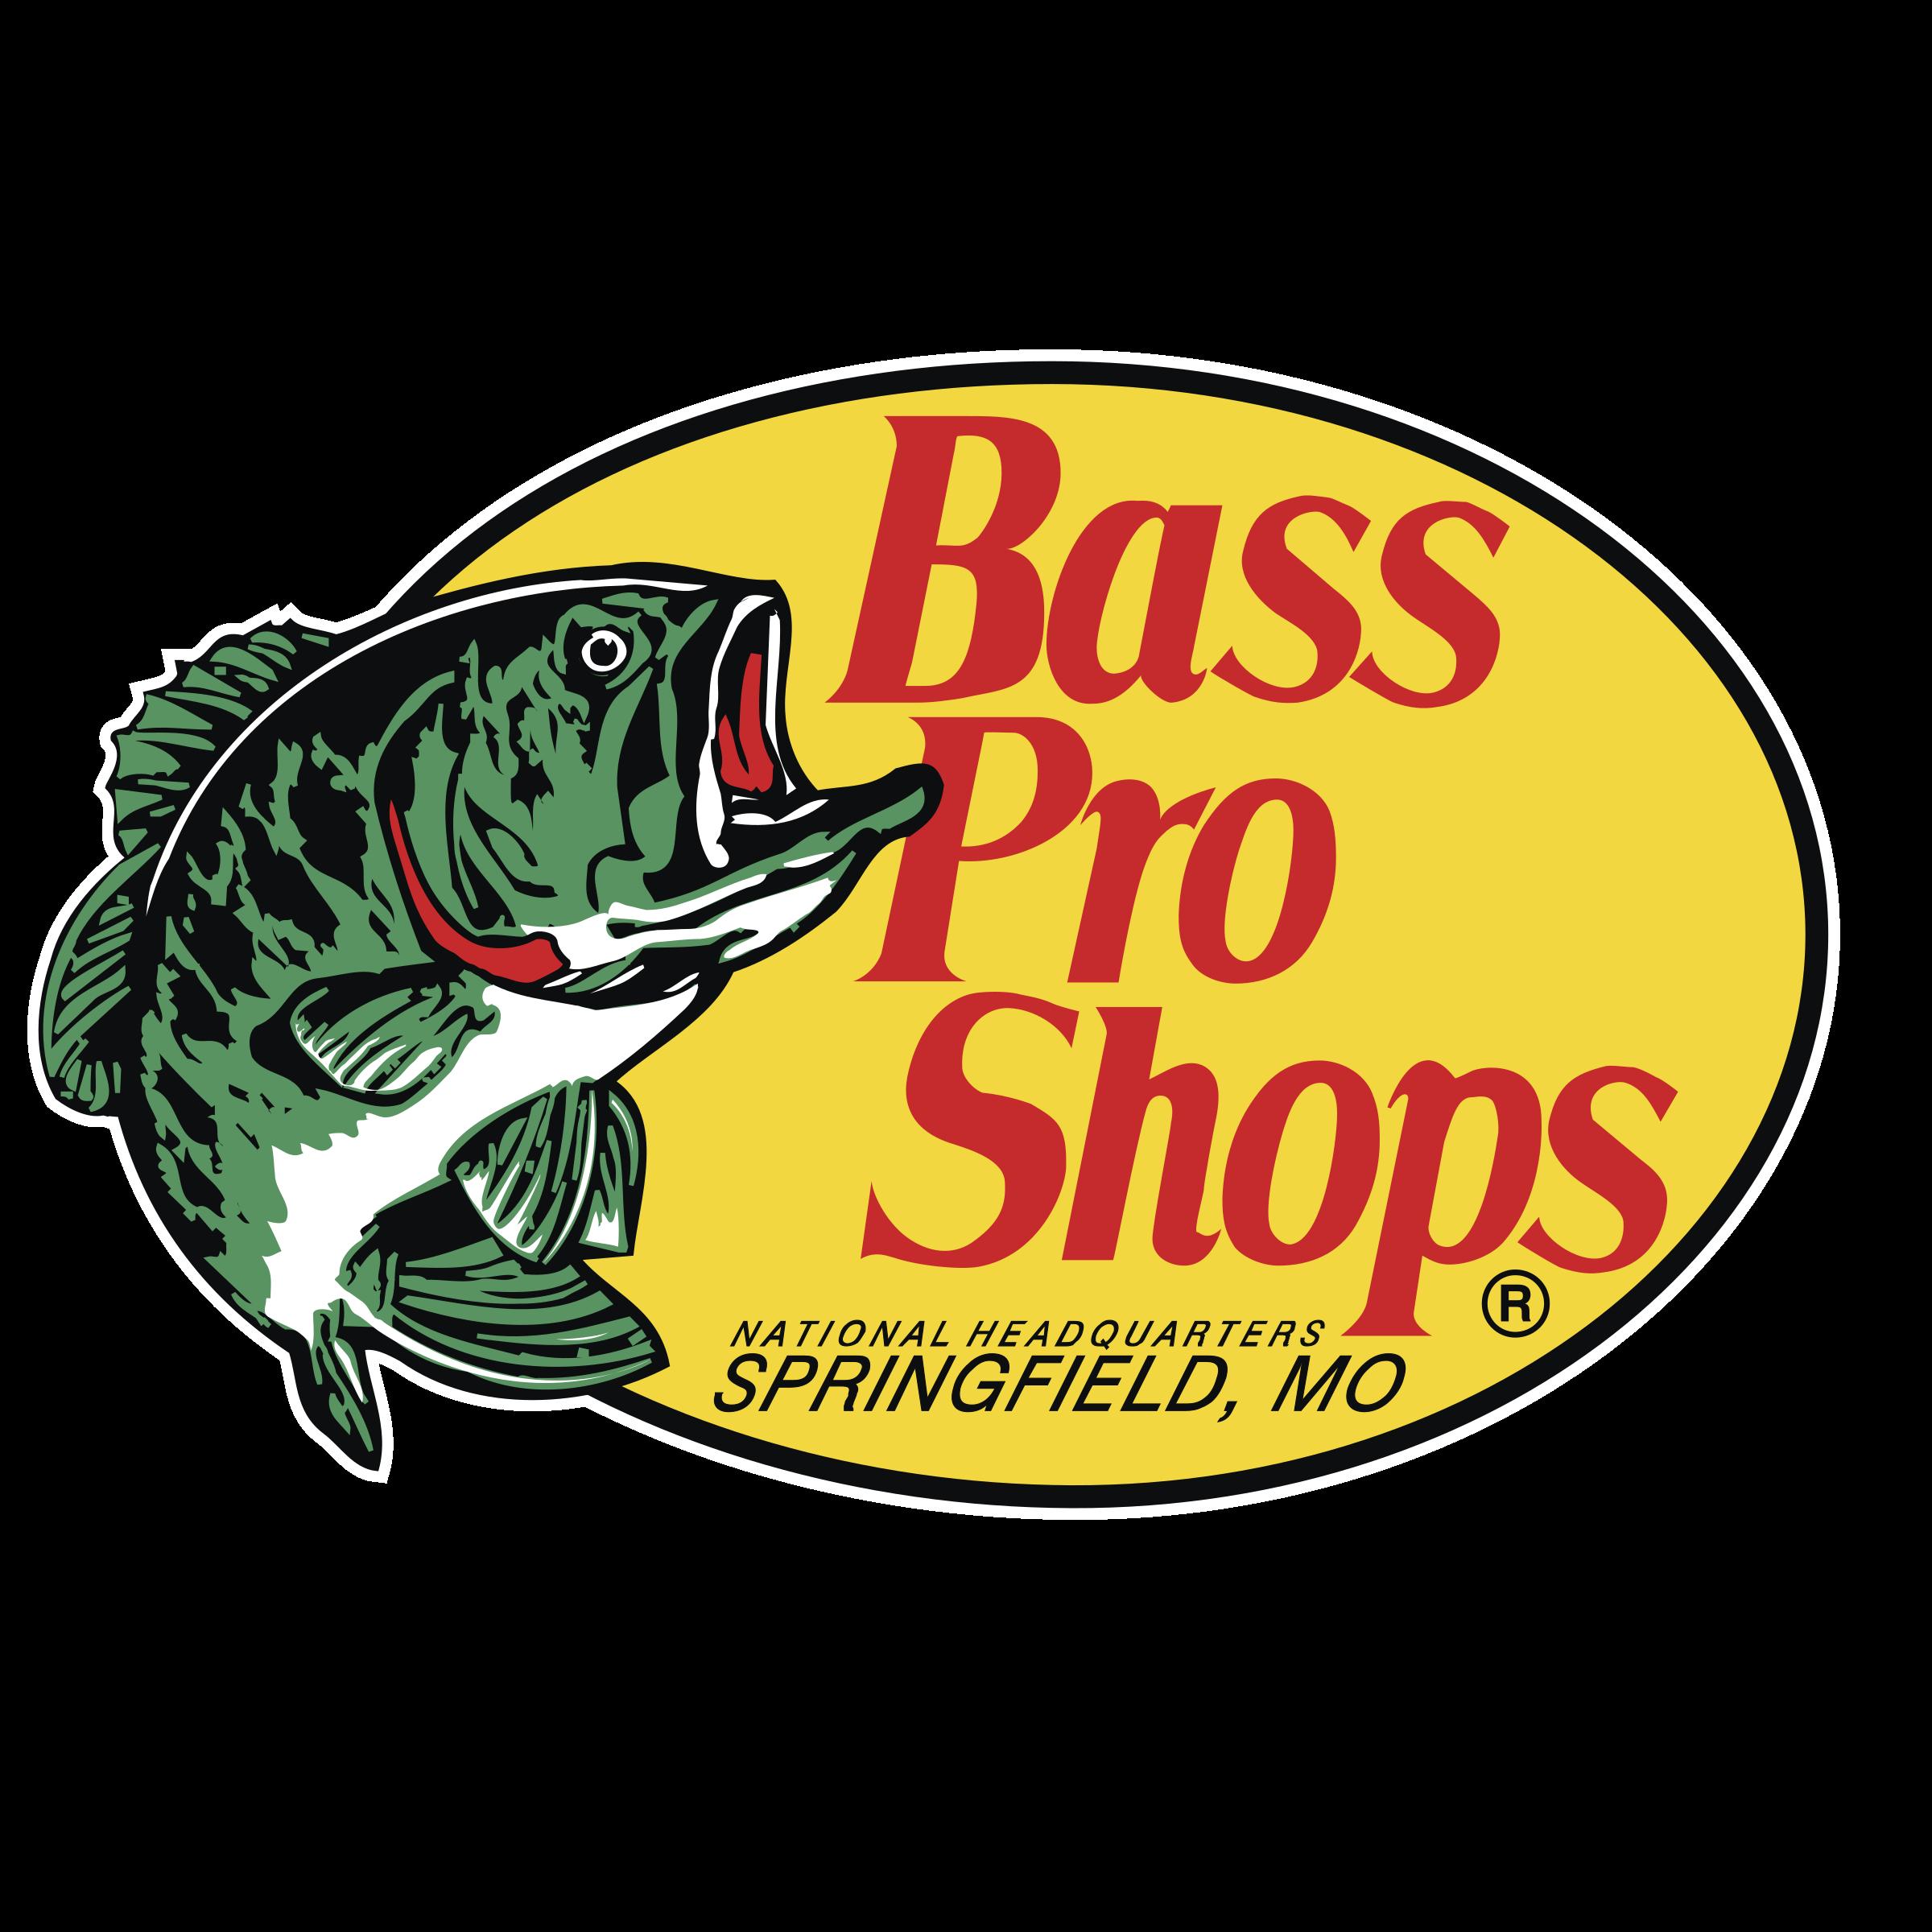 bass-pro-shops-1-logo-png-transparent.png